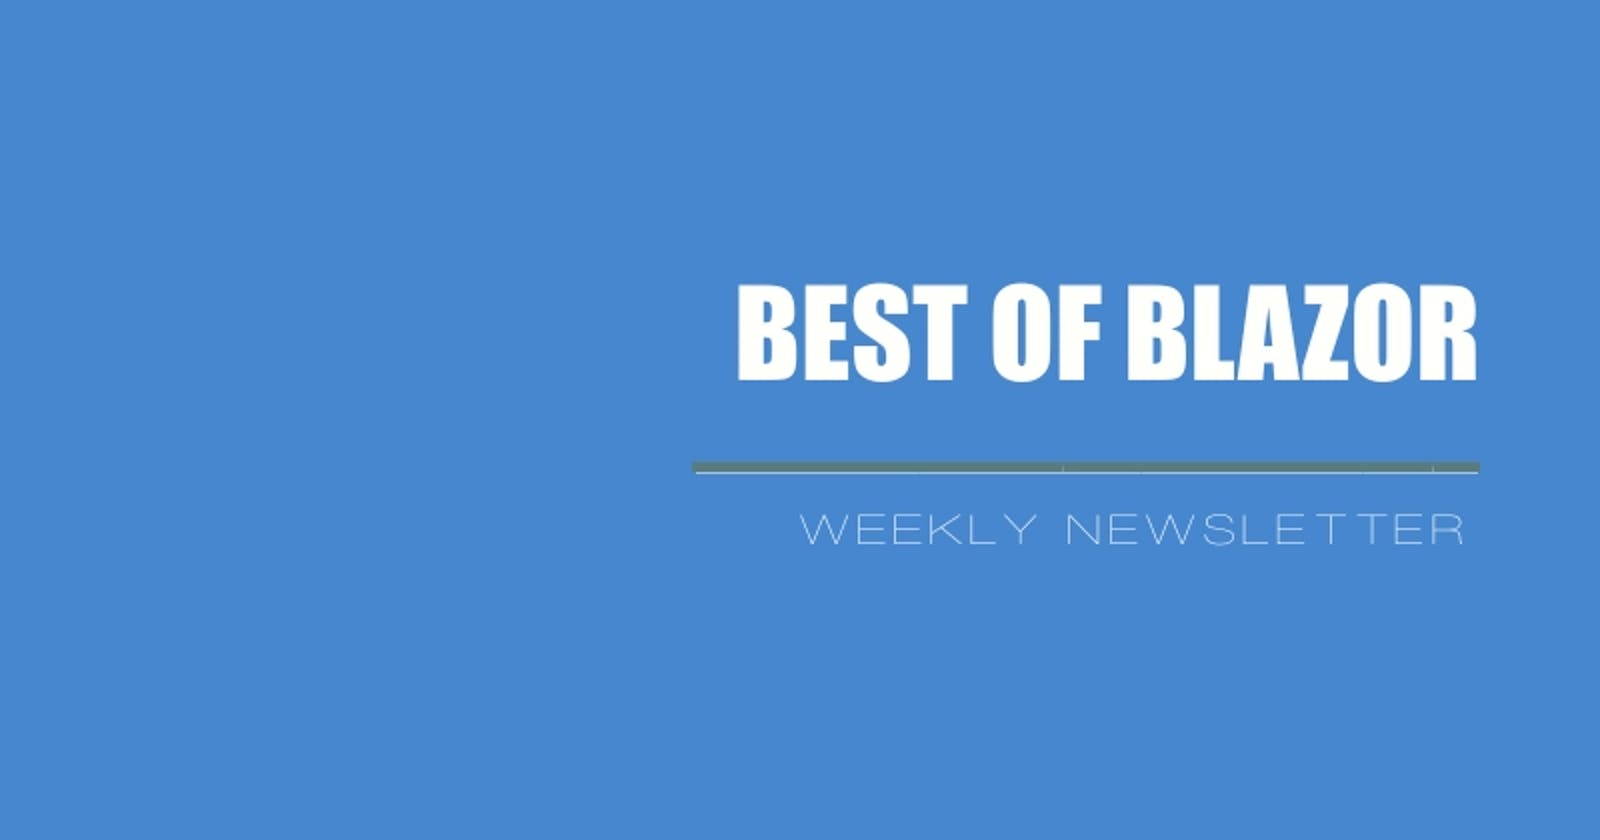 Blazor Weekly Newsletter #22